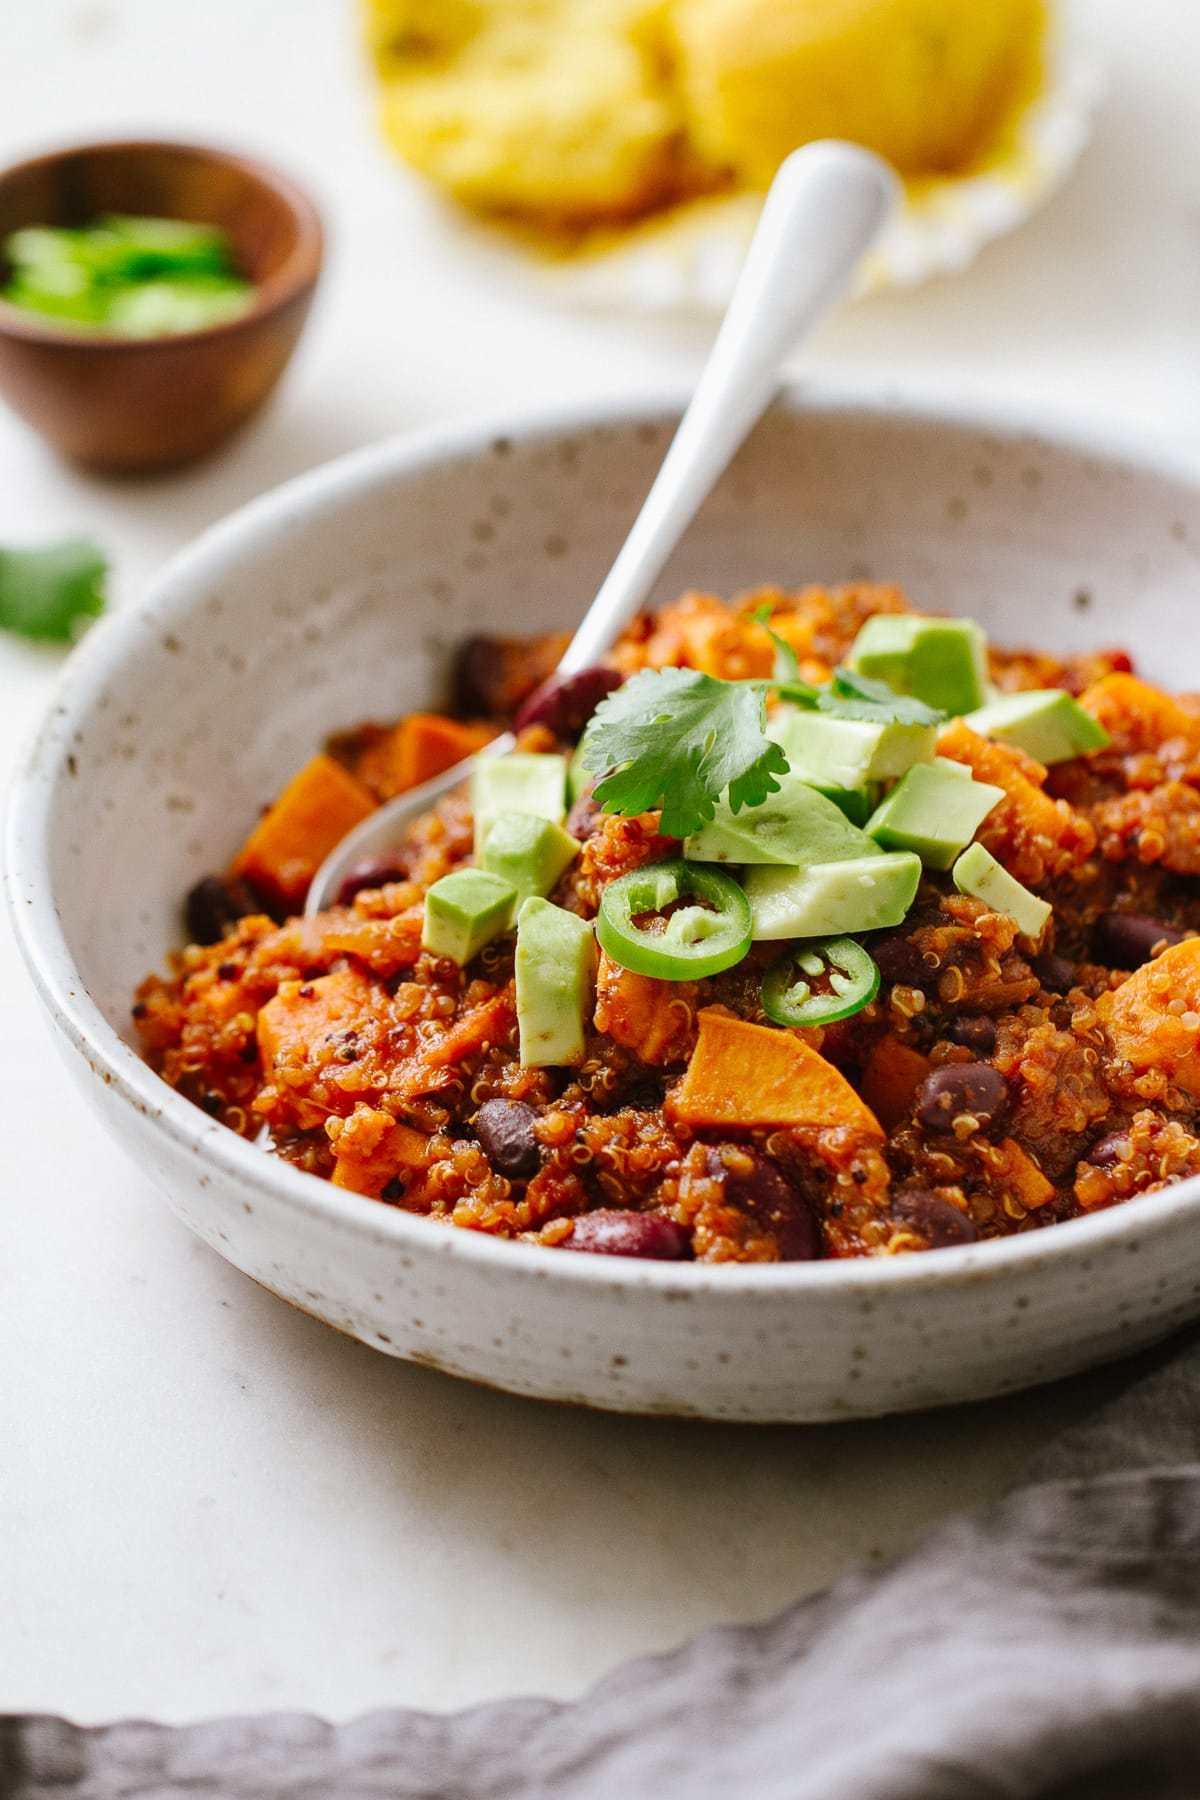 Sweet Potato & Quinoa Chili - Easy One Pot Recipe | Stovetop + Slow Cooker